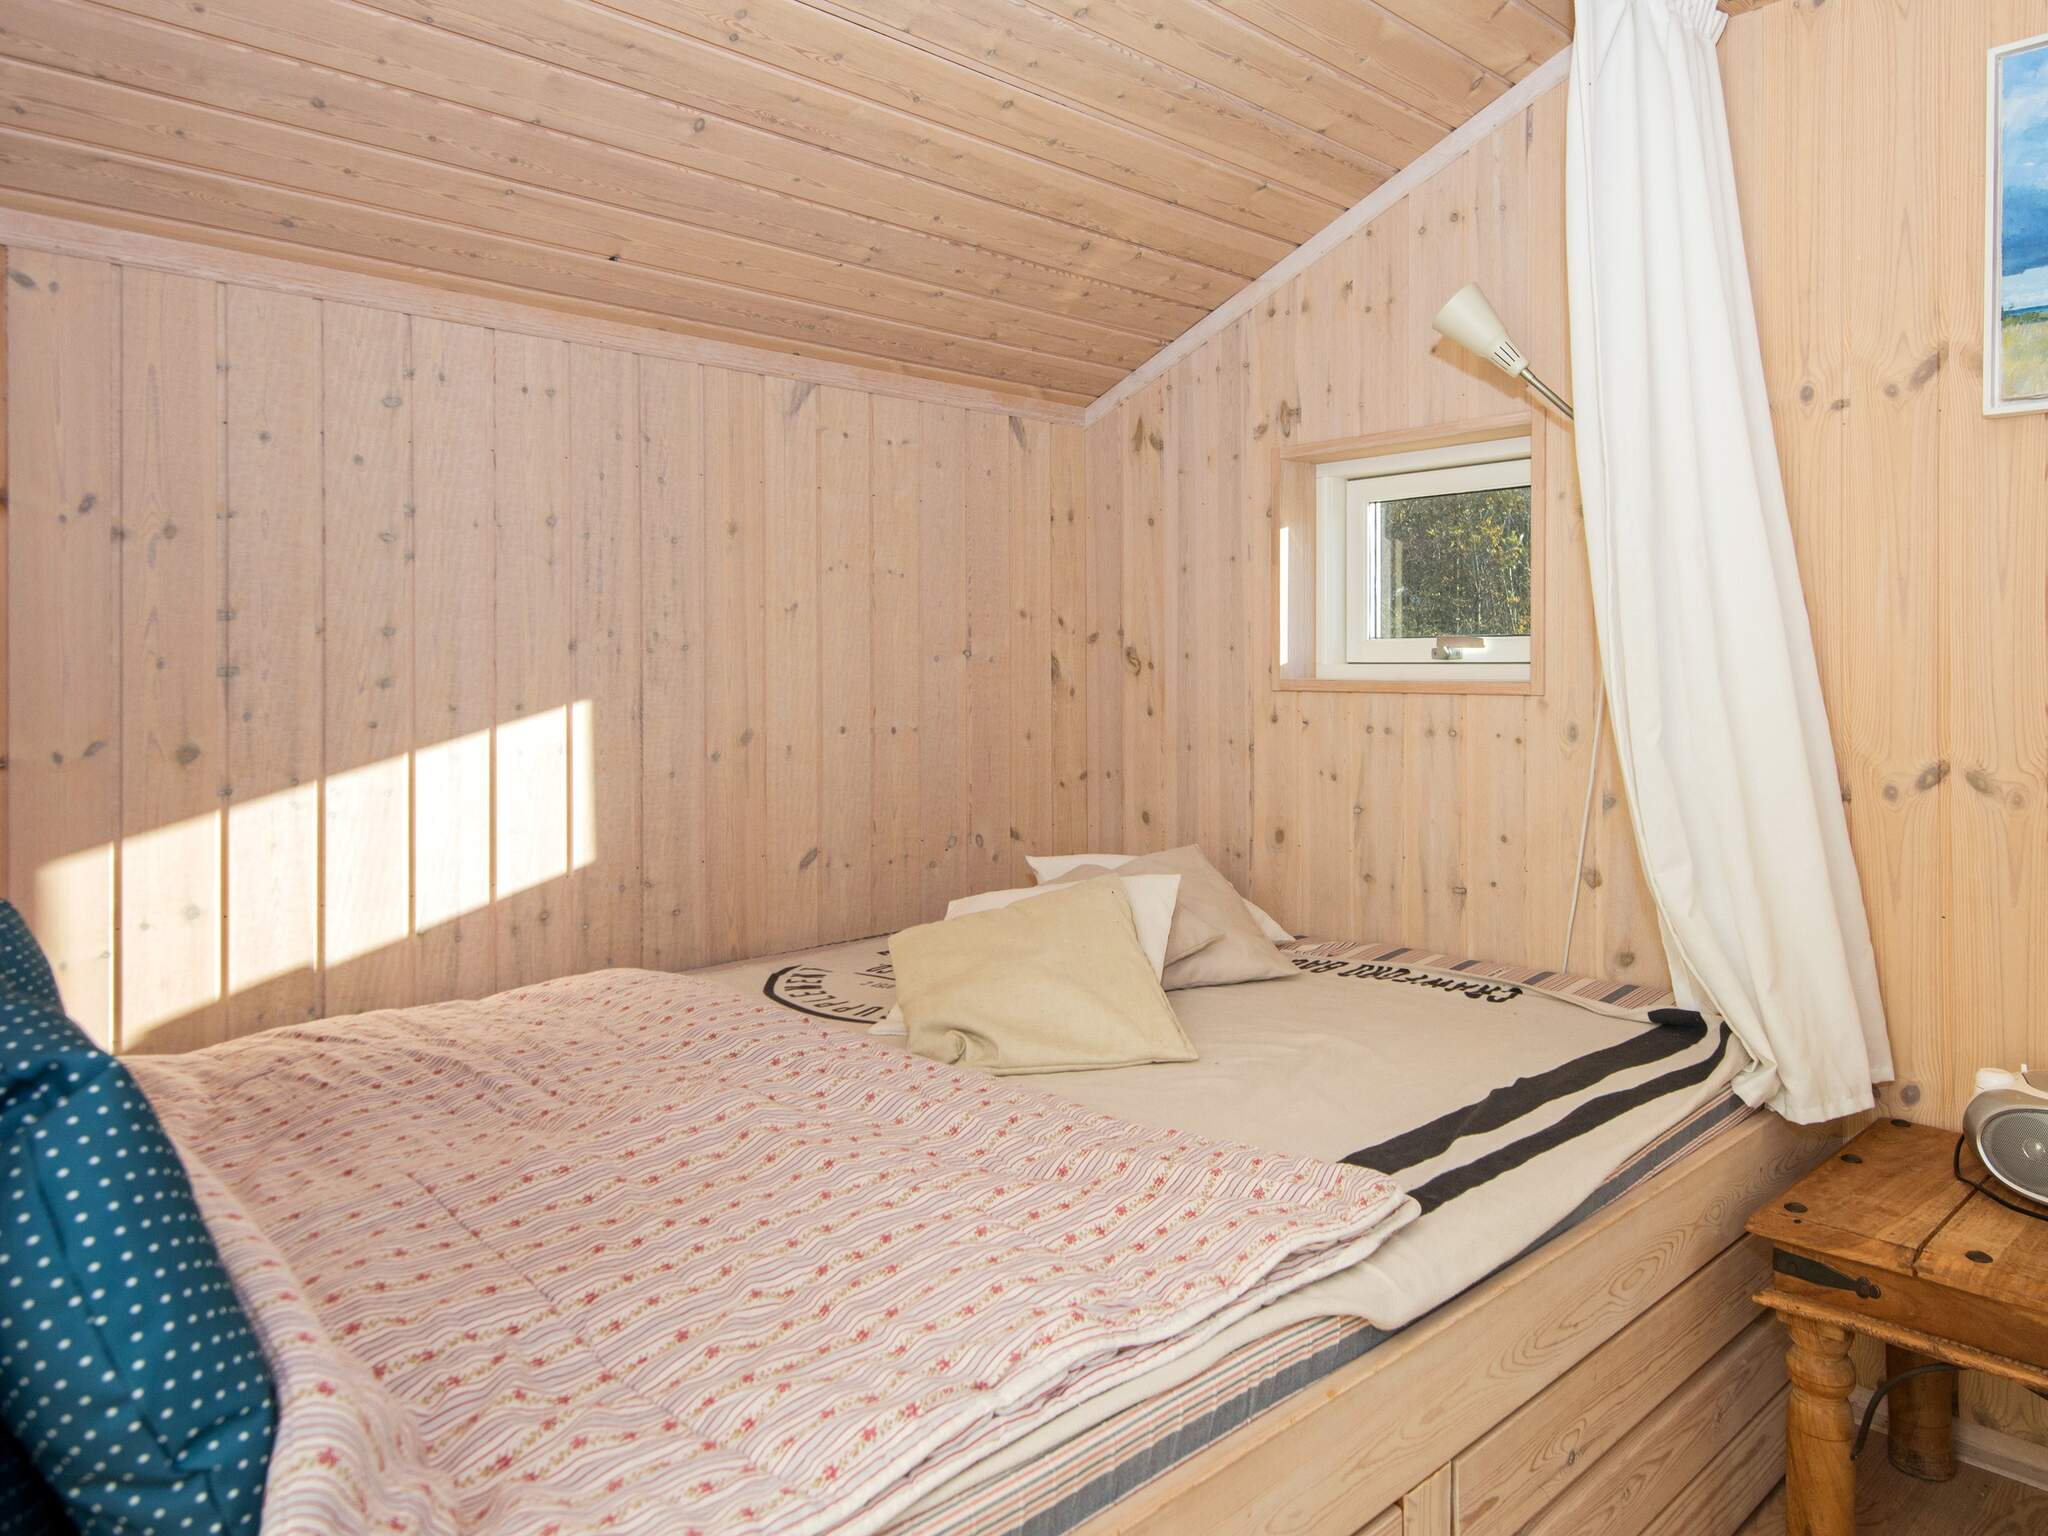 Maison de vacances Helgenæs (681779), Knebel, , Mer Baltique danoise, Danemark, image 10